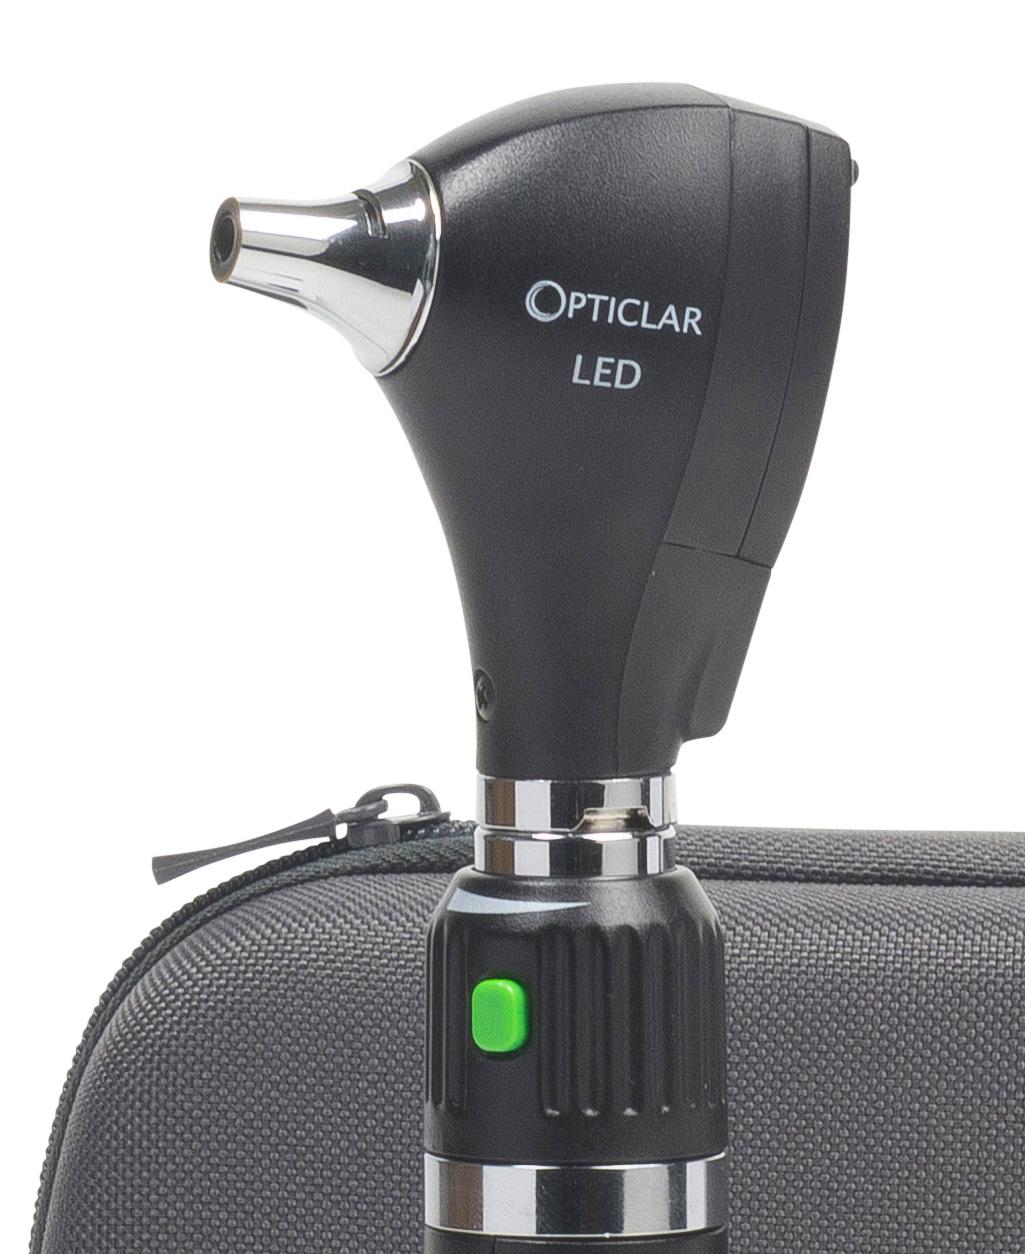 S1 LED Practice Otoscope Set - E Lithium rechargeable desk system